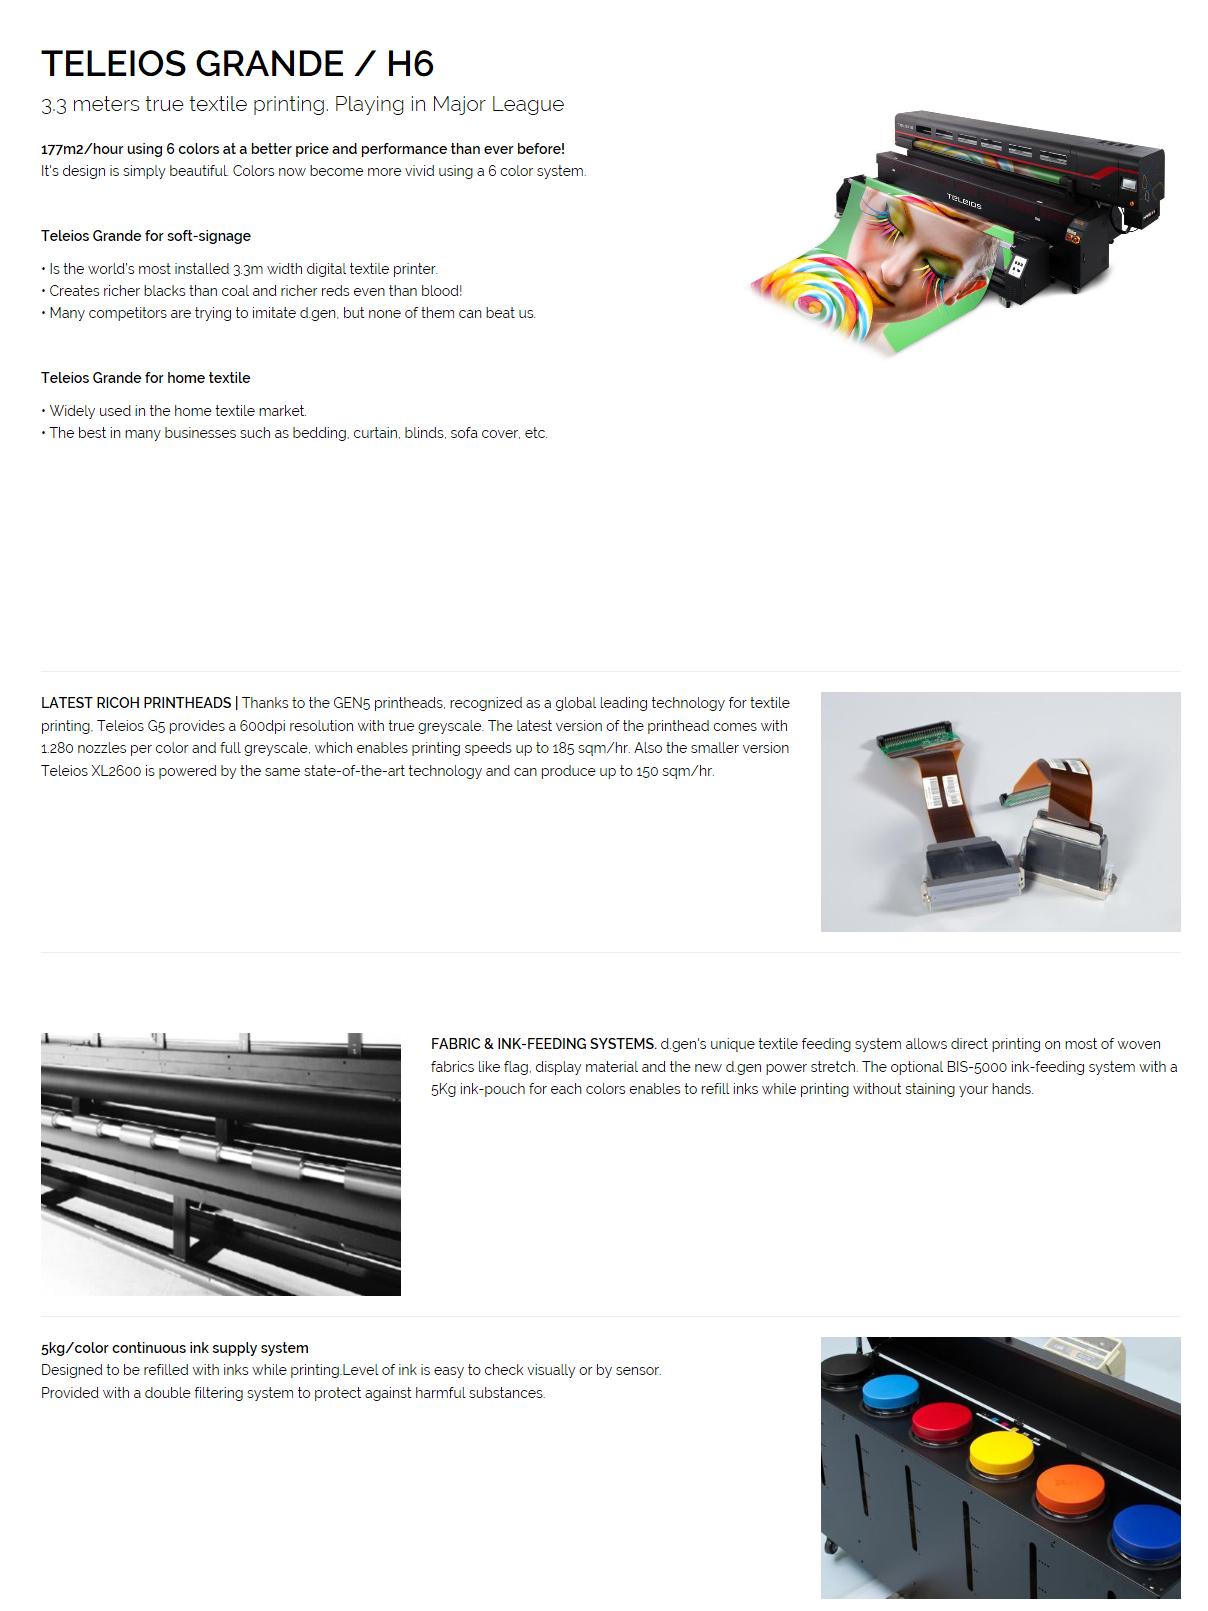 DGEN Printer TELEIOS GRANDE / H6